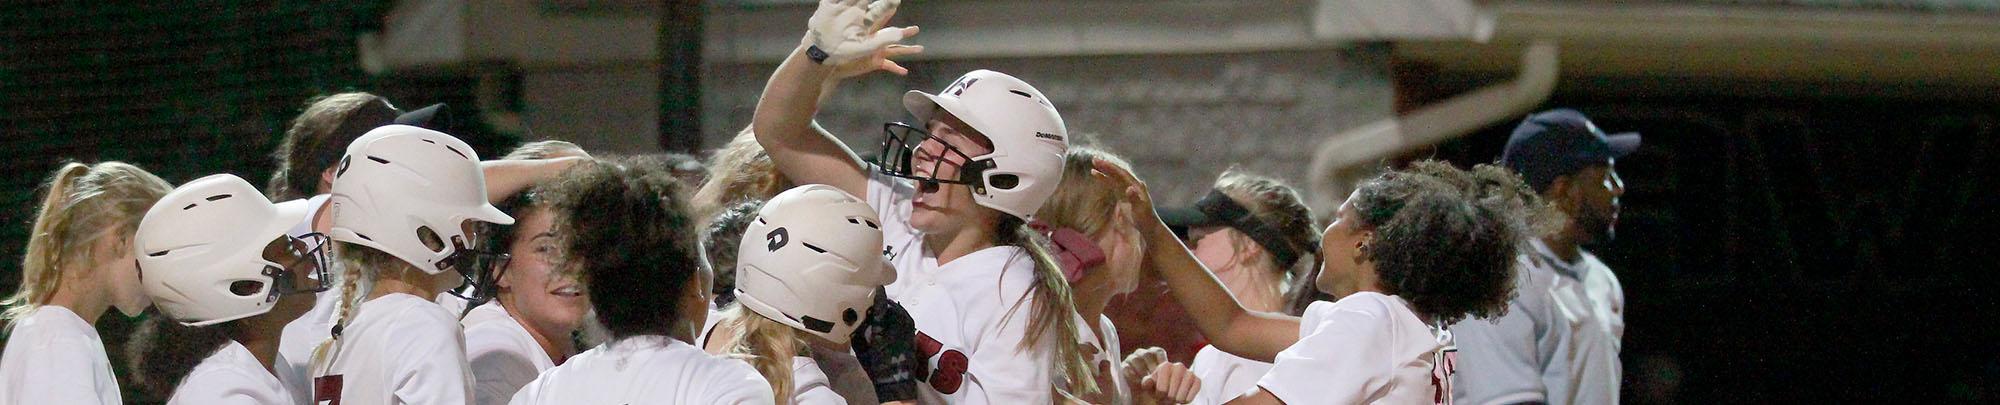 Girls softball team huddling up during a game